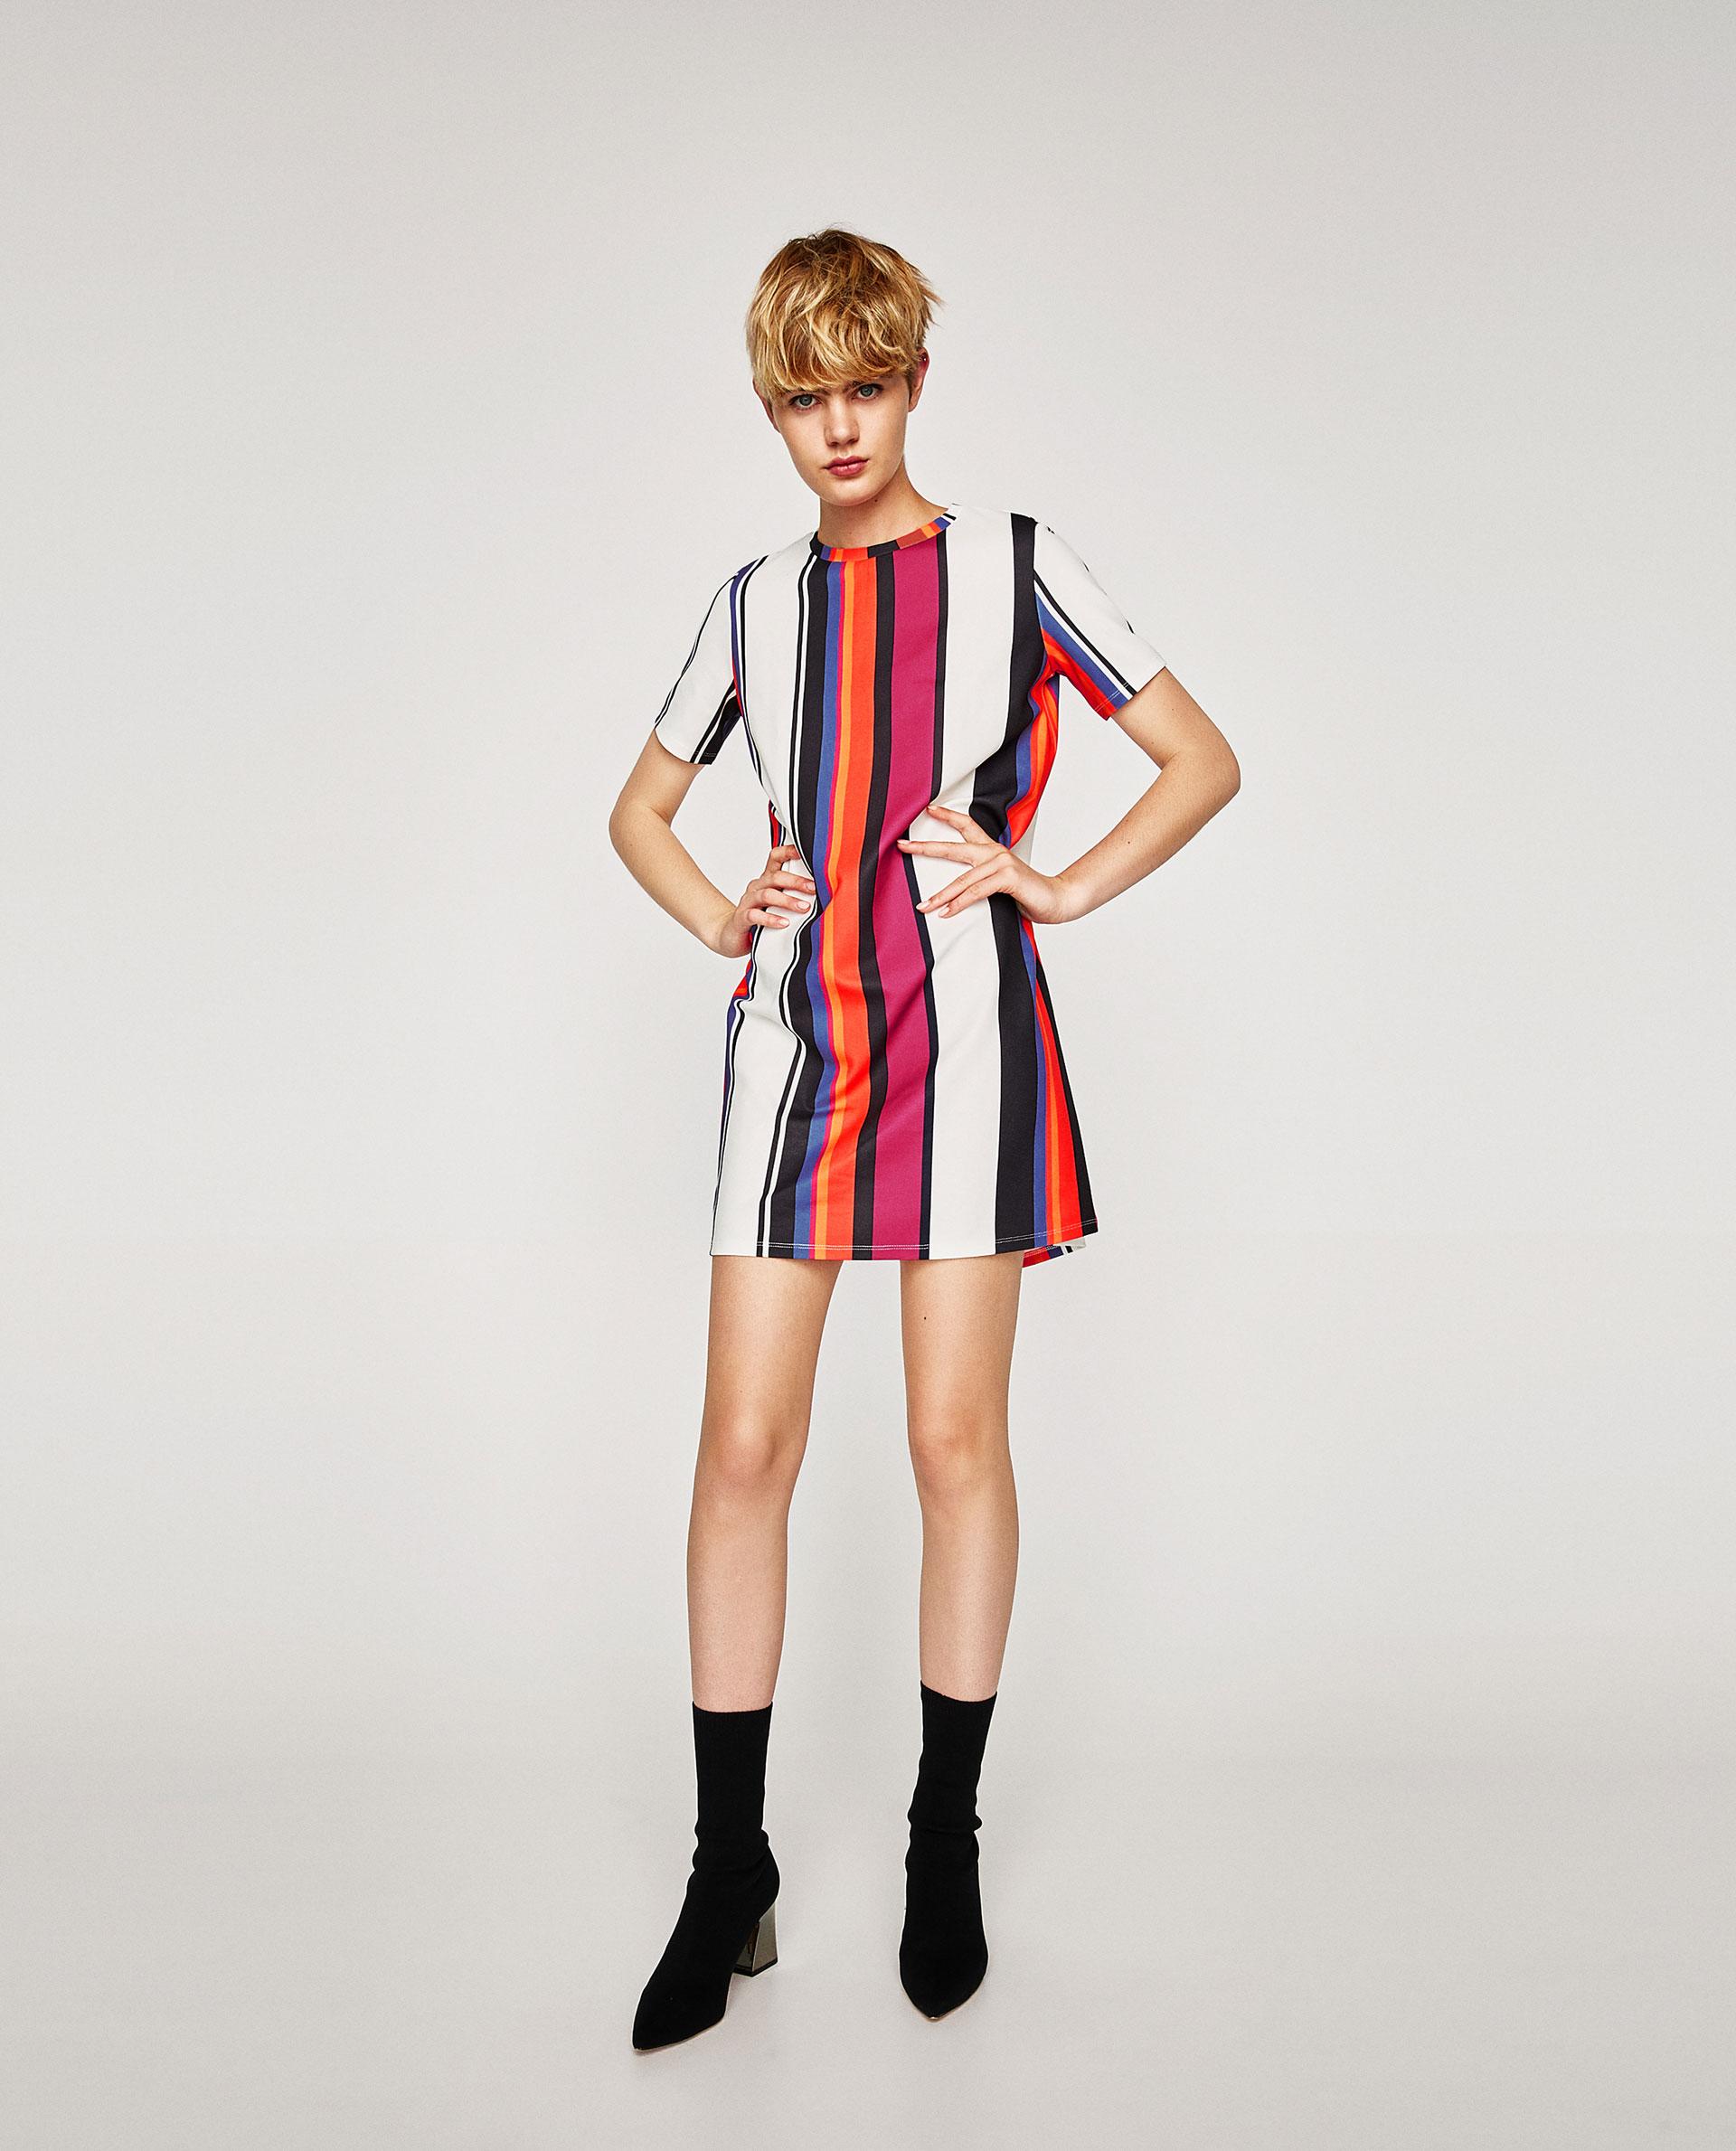 Sayuri Villalba - Zara Print Design Dress